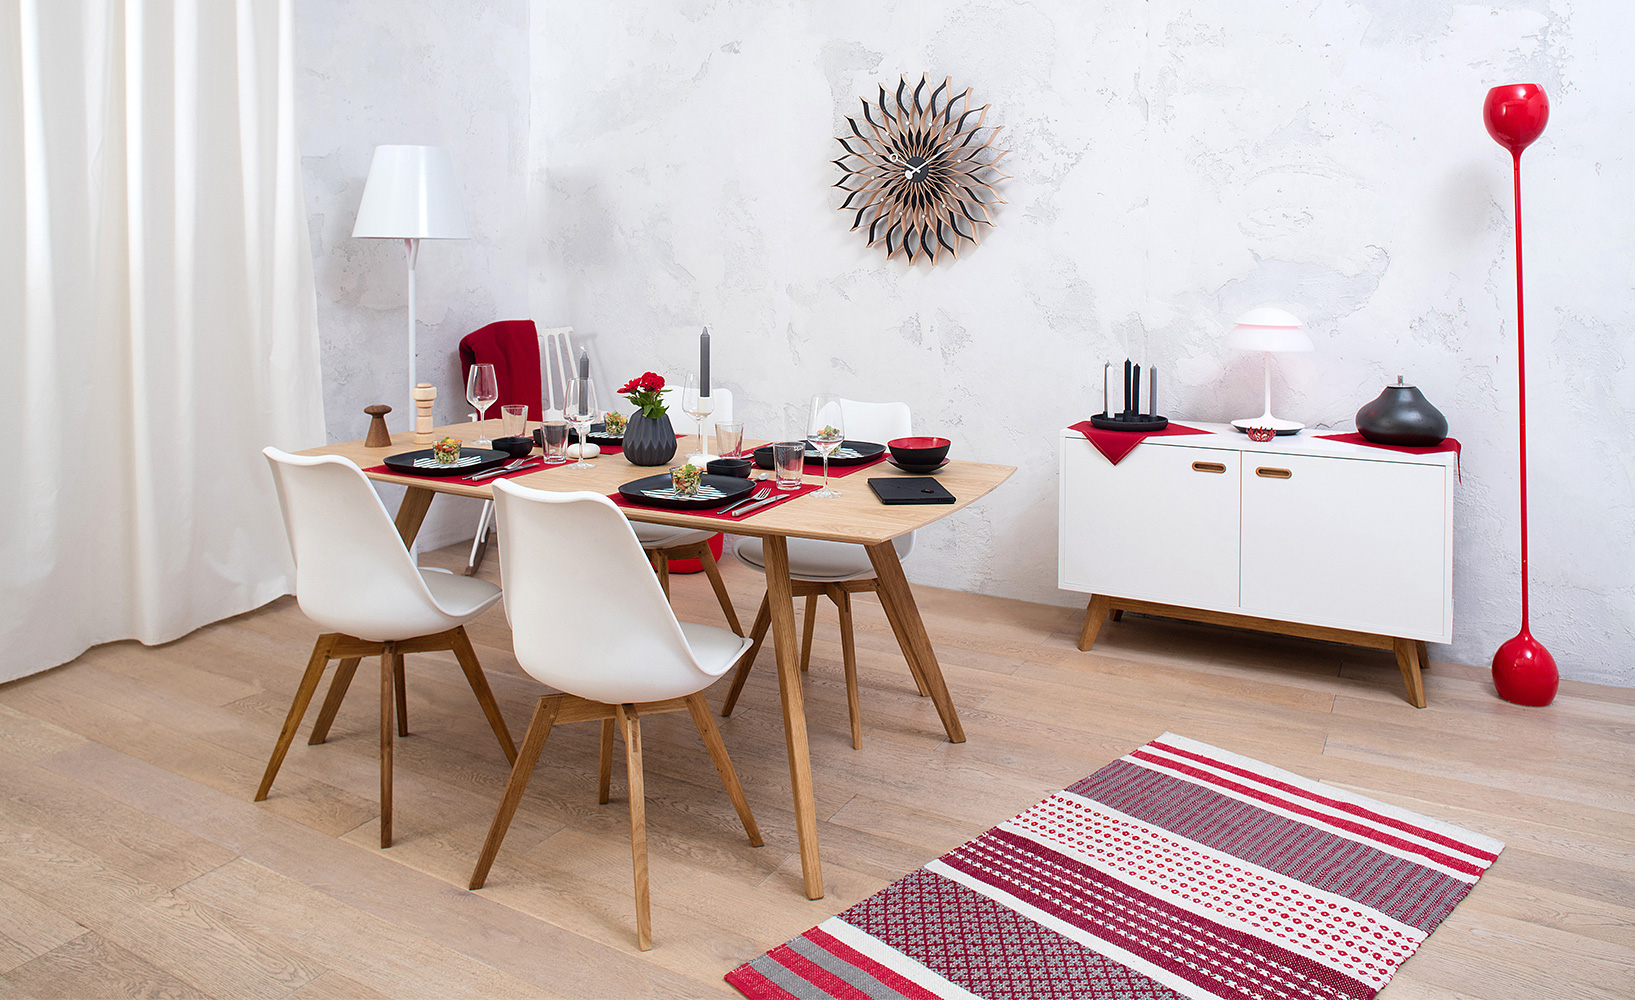 designtrends herbst winter 2015 amazon workshop. Black Bedroom Furniture Sets. Home Design Ideas